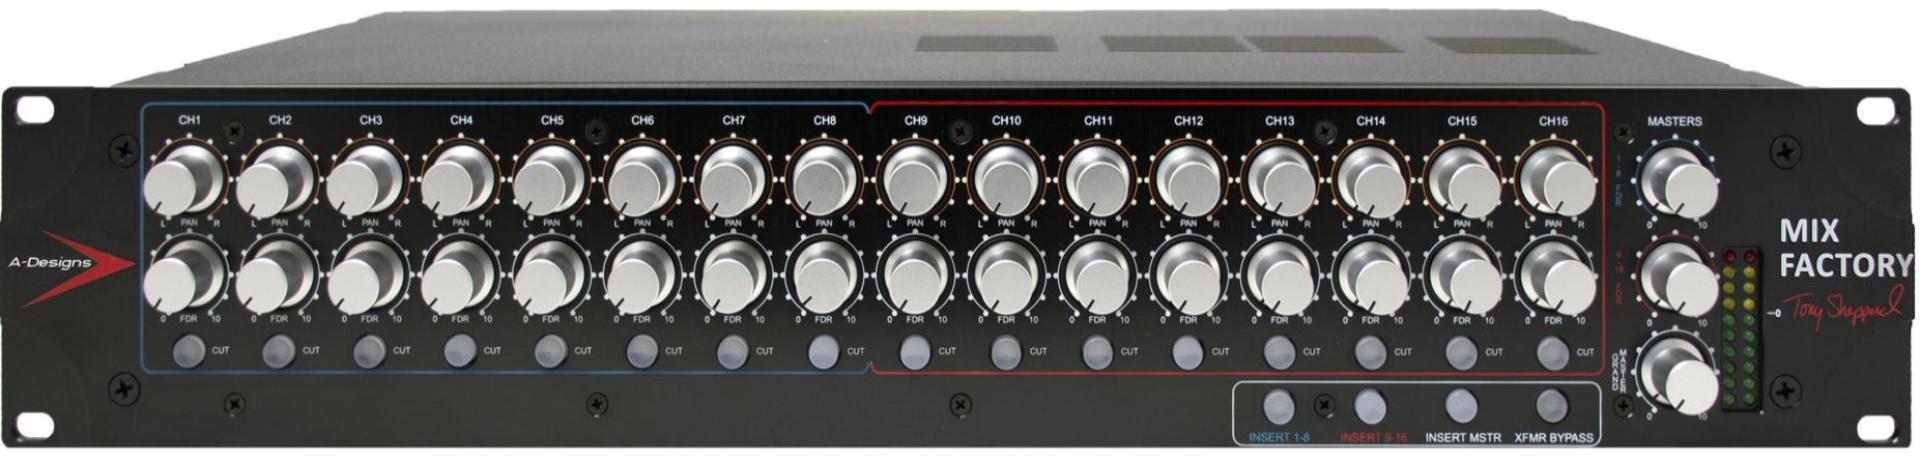 A-Designs-Mix-Factory-front